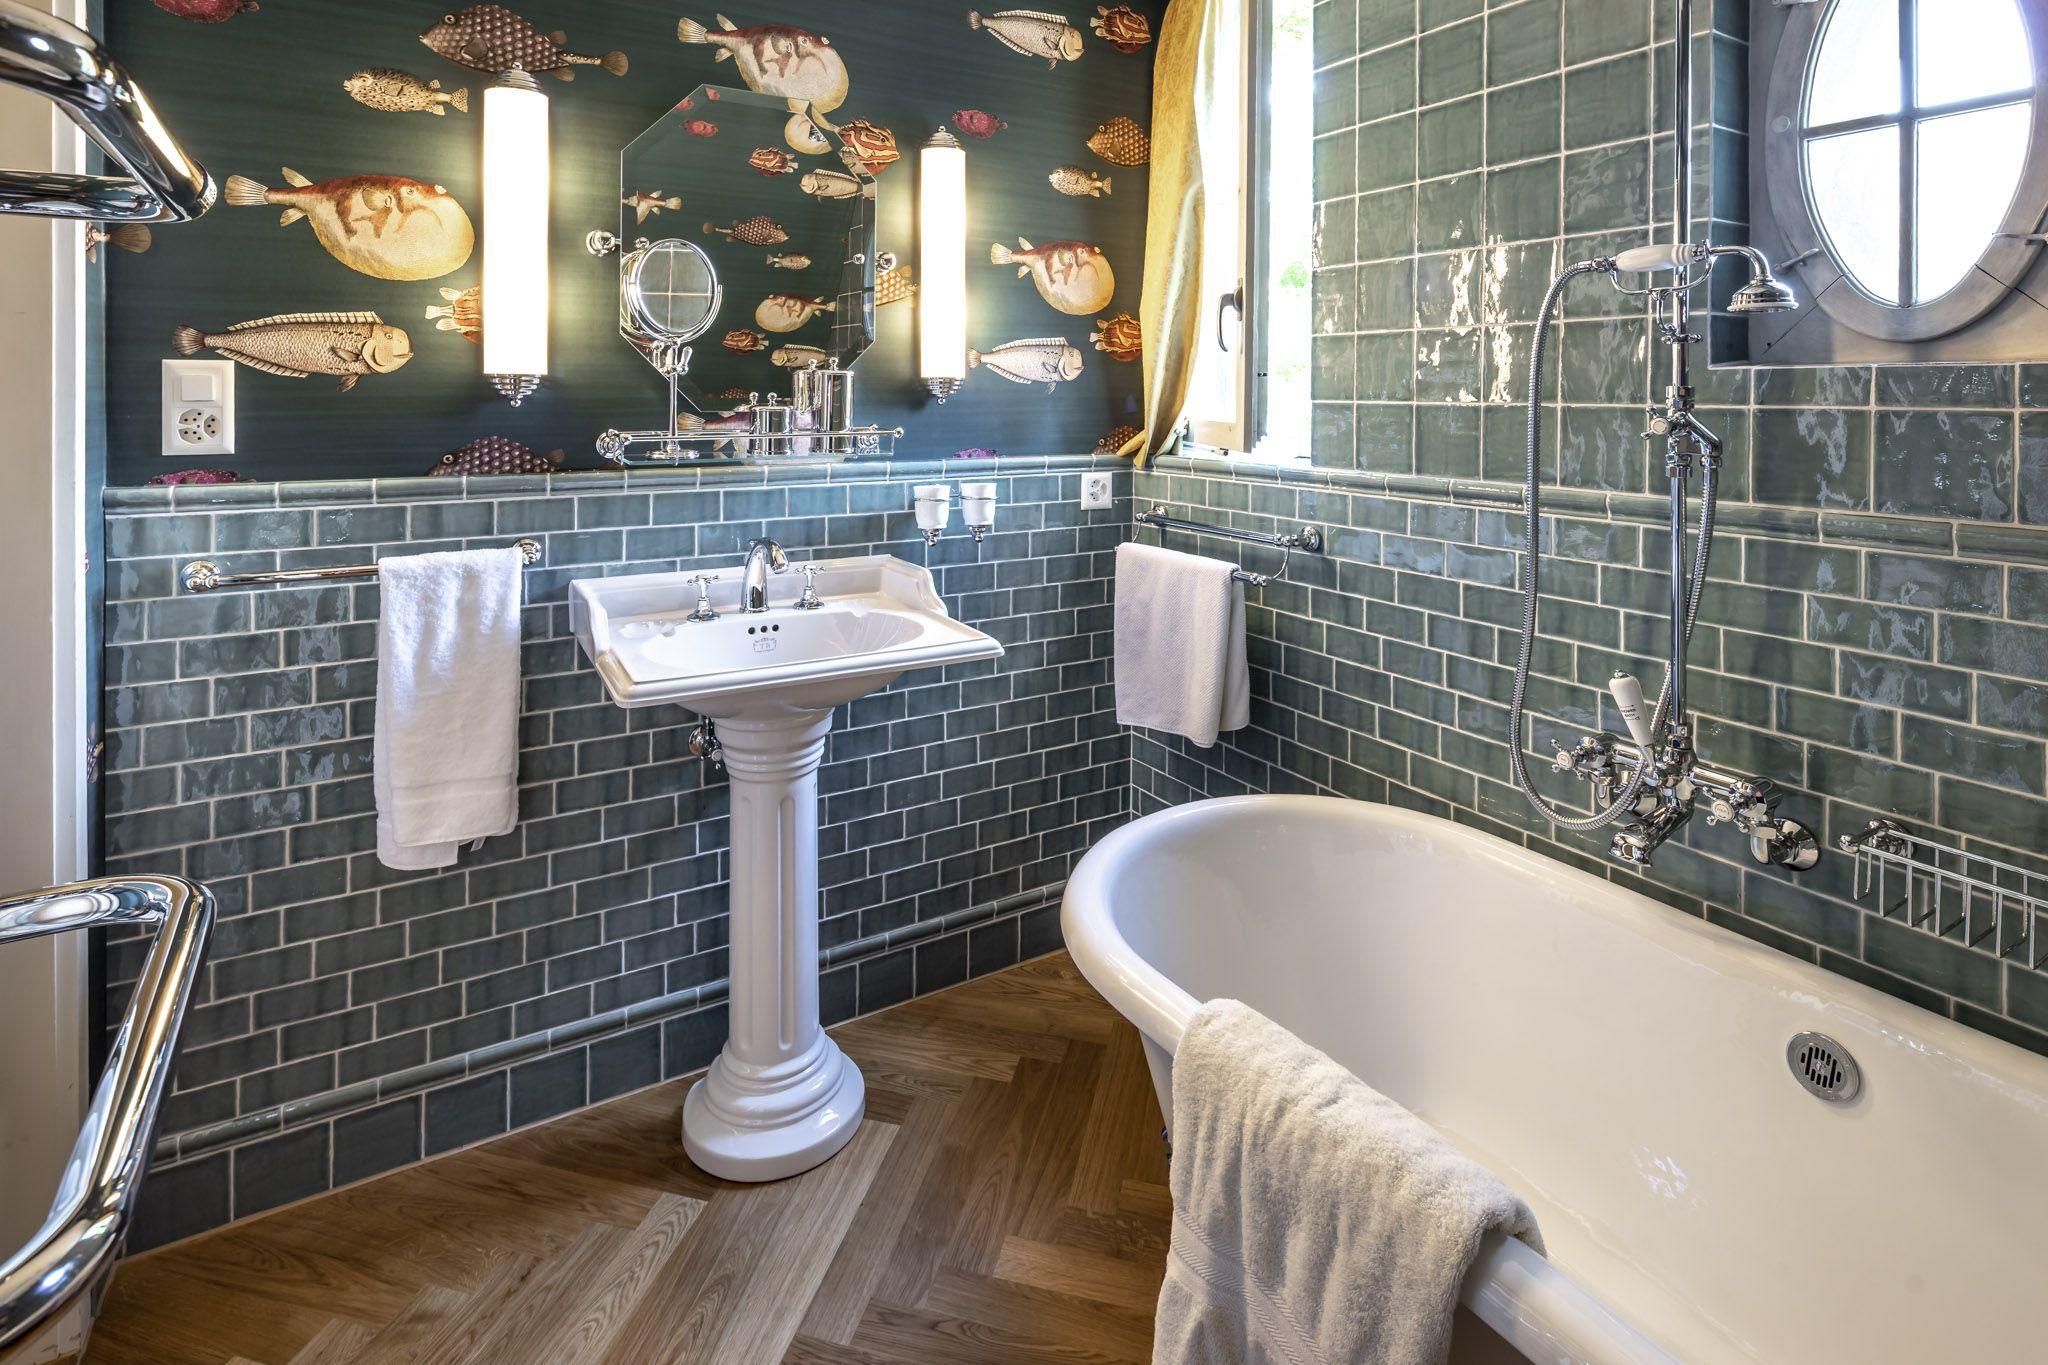 Vintage Badezimmer Badezimmer Vintage In 2020 Vintage Badezimmer Badezimmer Und Schone Badezimmer